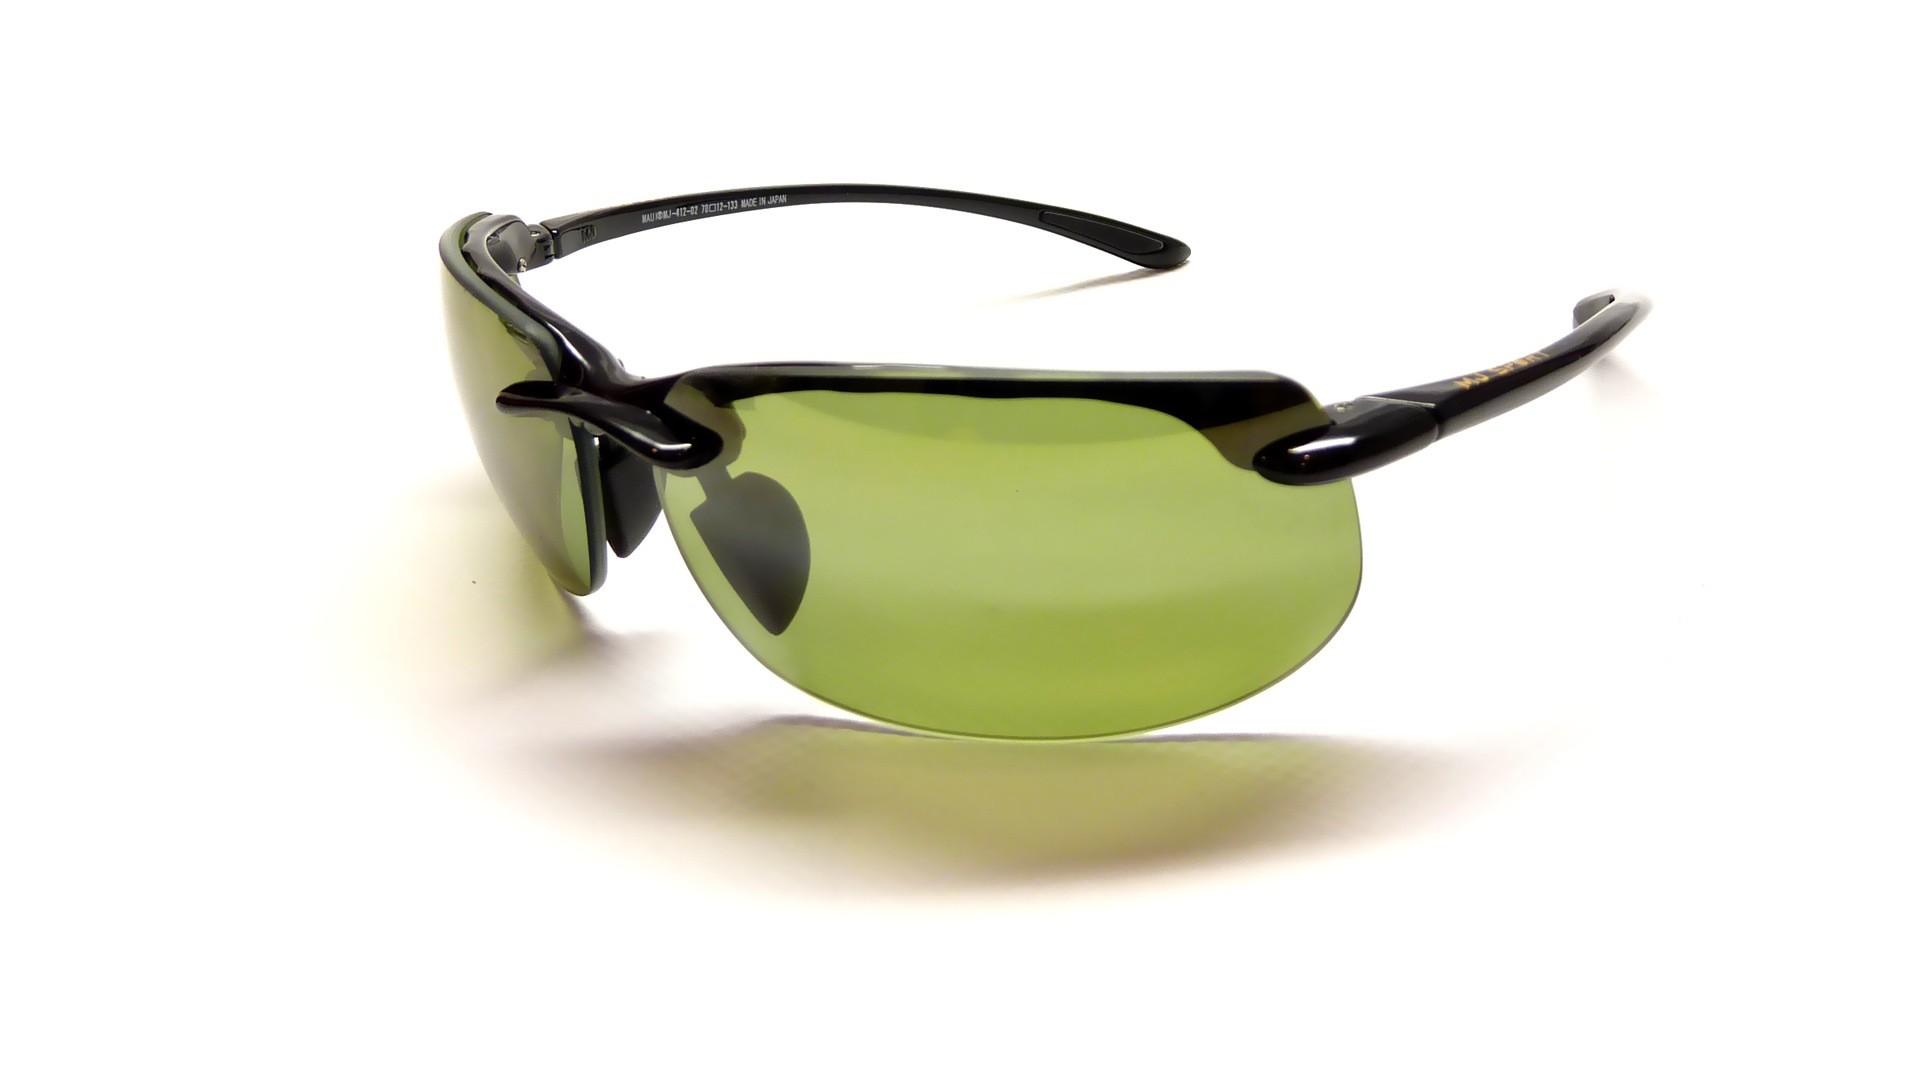 6a8b81686c4 Oakley Hd Polarized Vs Maui Jim